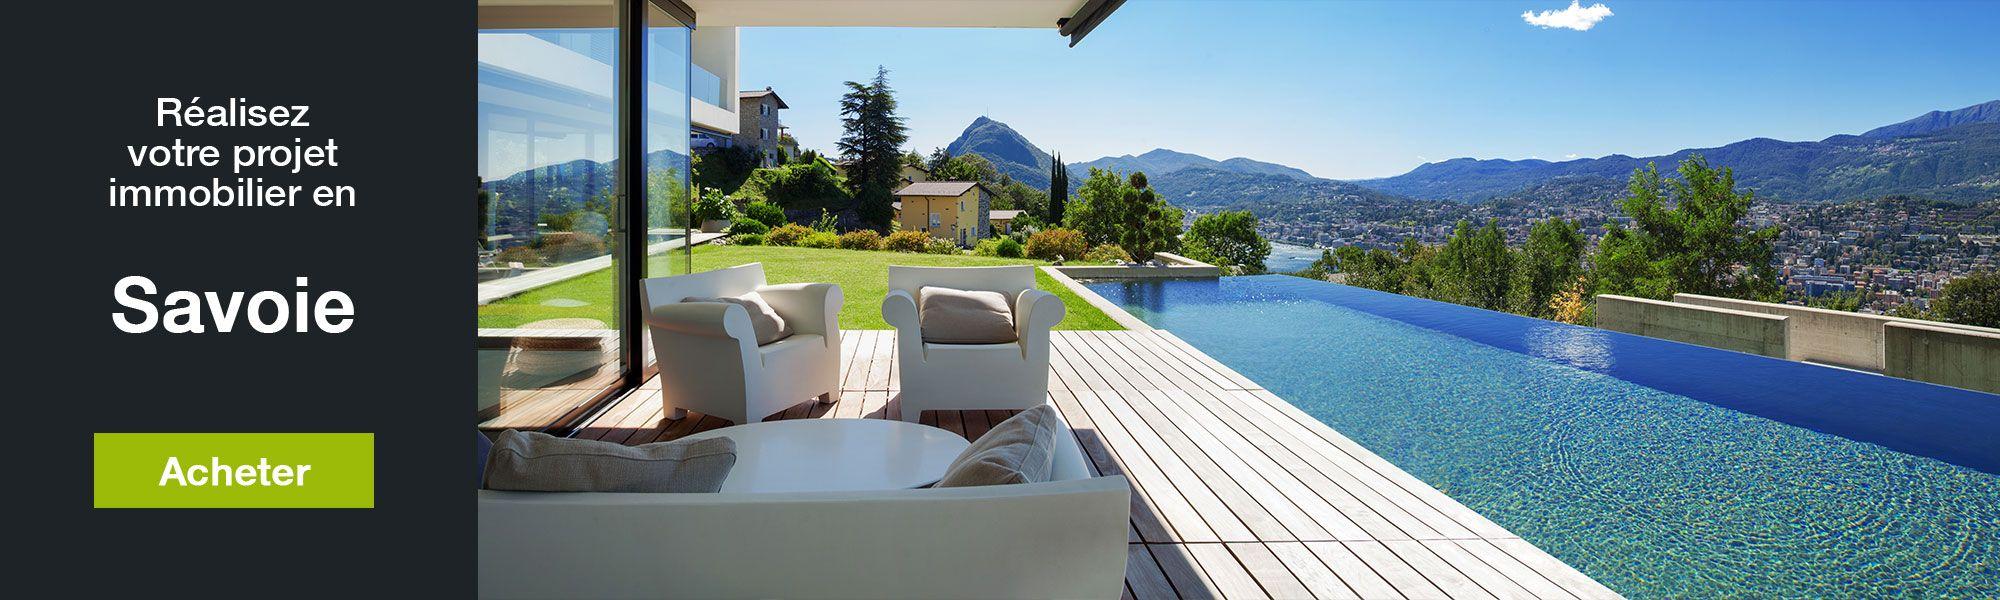 Achat immobilier Savoie et Albertville